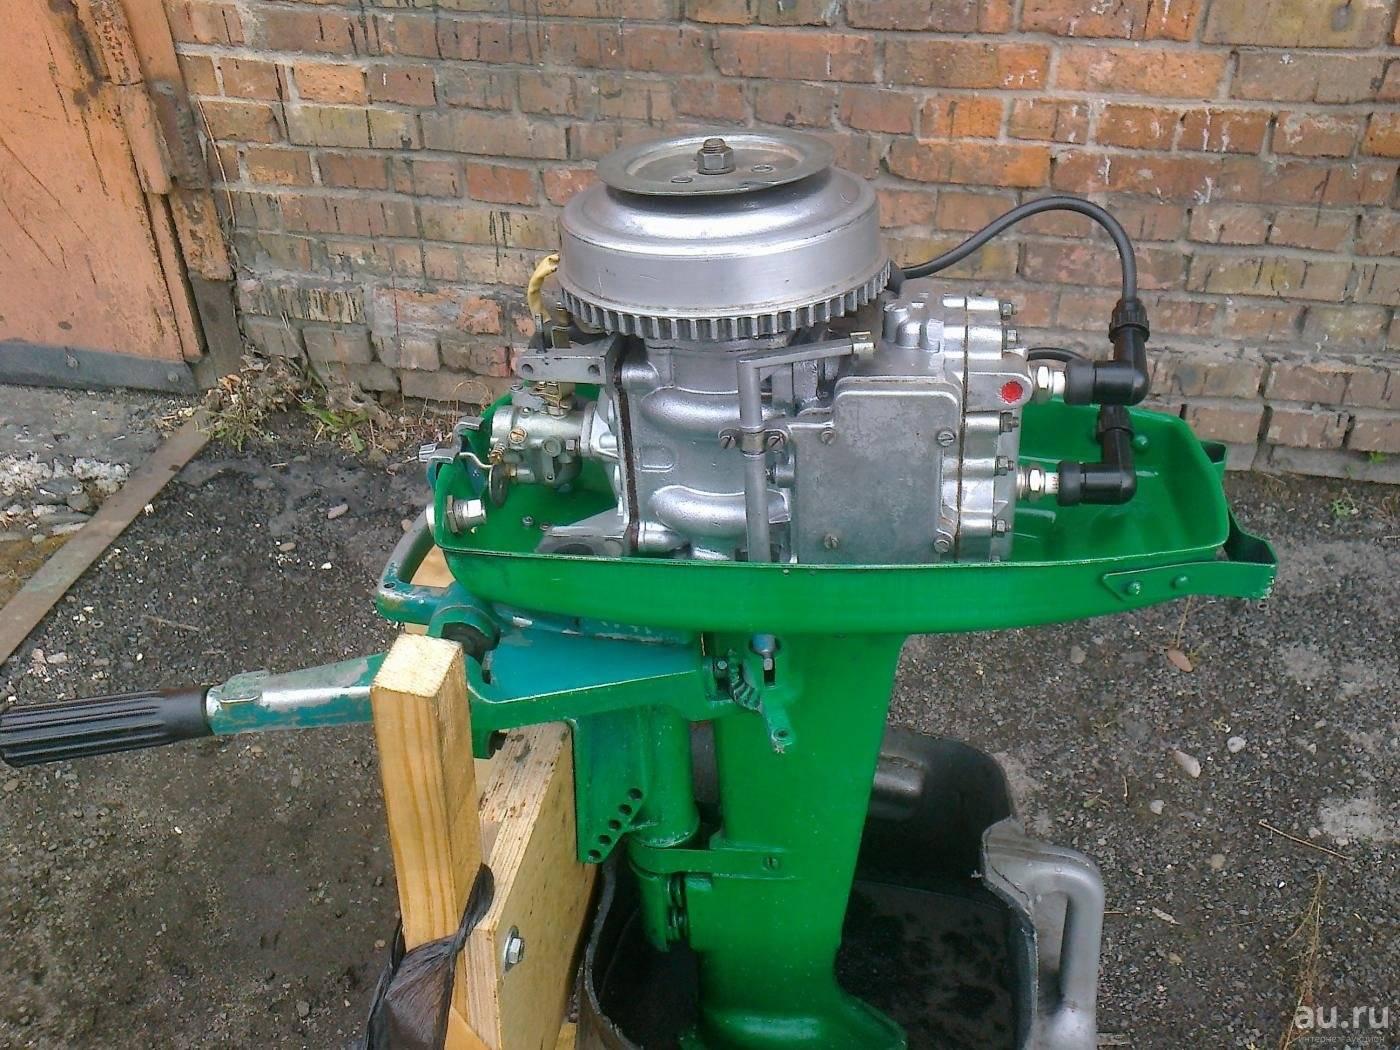 Лодочный мотор ветерок 8: обзор и фото